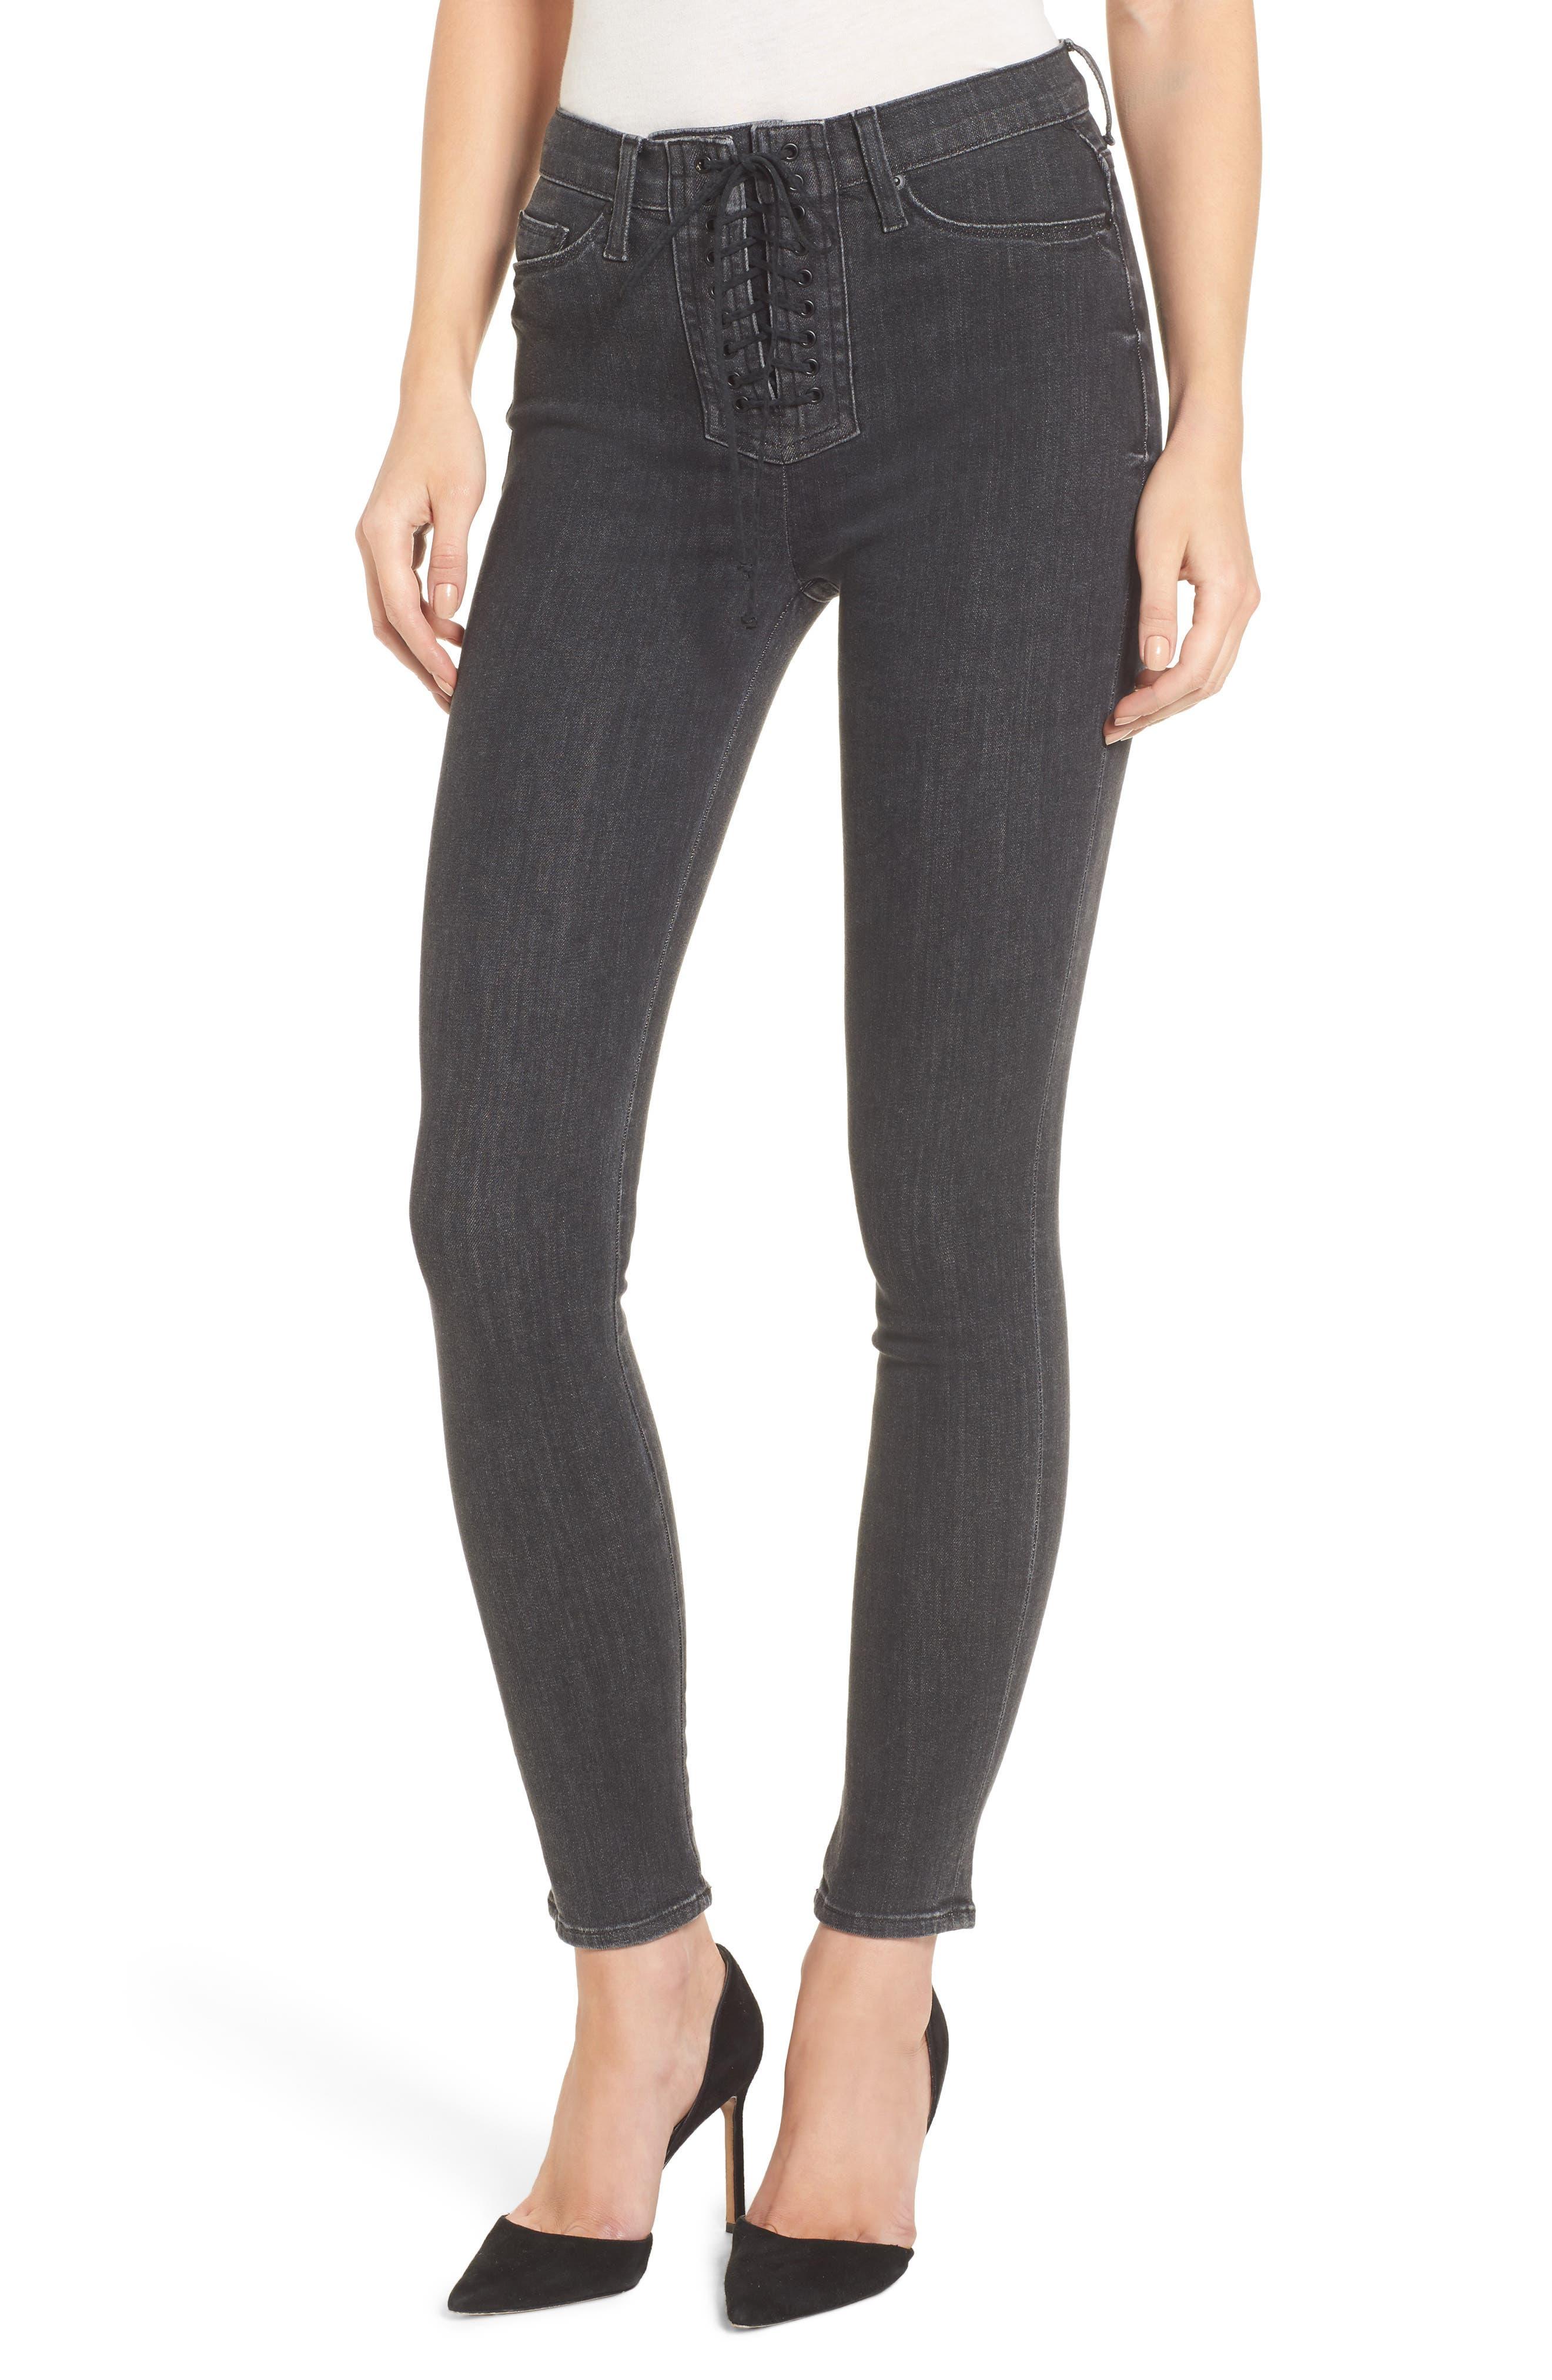 Bullocks High Waist Lace-Up Skinny Jeans,                         Main,                         color, Disarm